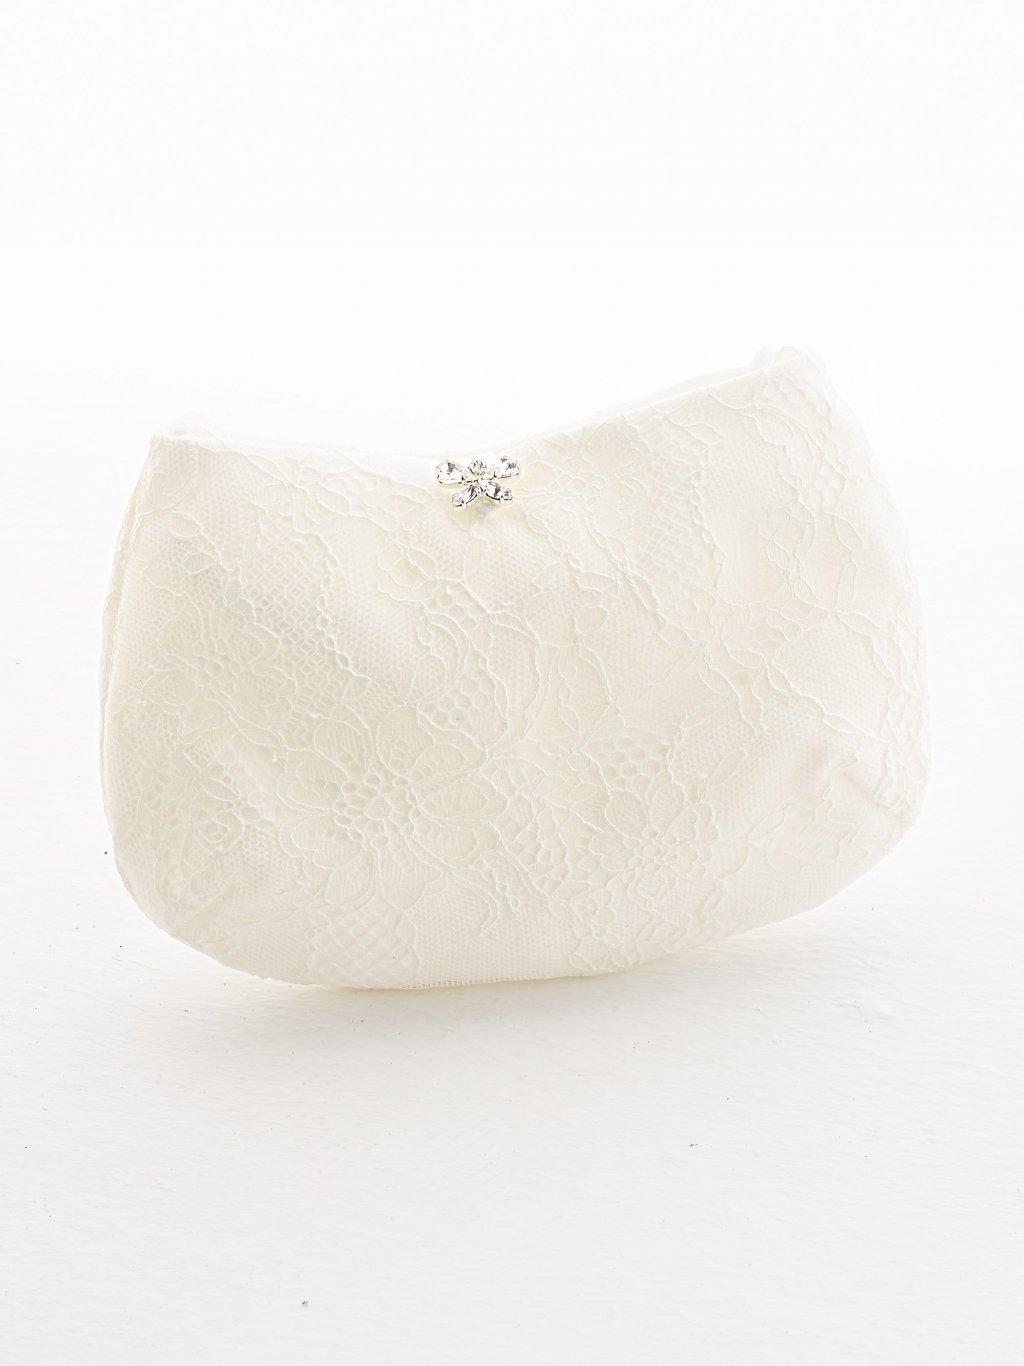 studioagnes Bianco Evento bridal handbag svatebni kabelka psanicko krajkove s krajkou pro nevestu T14